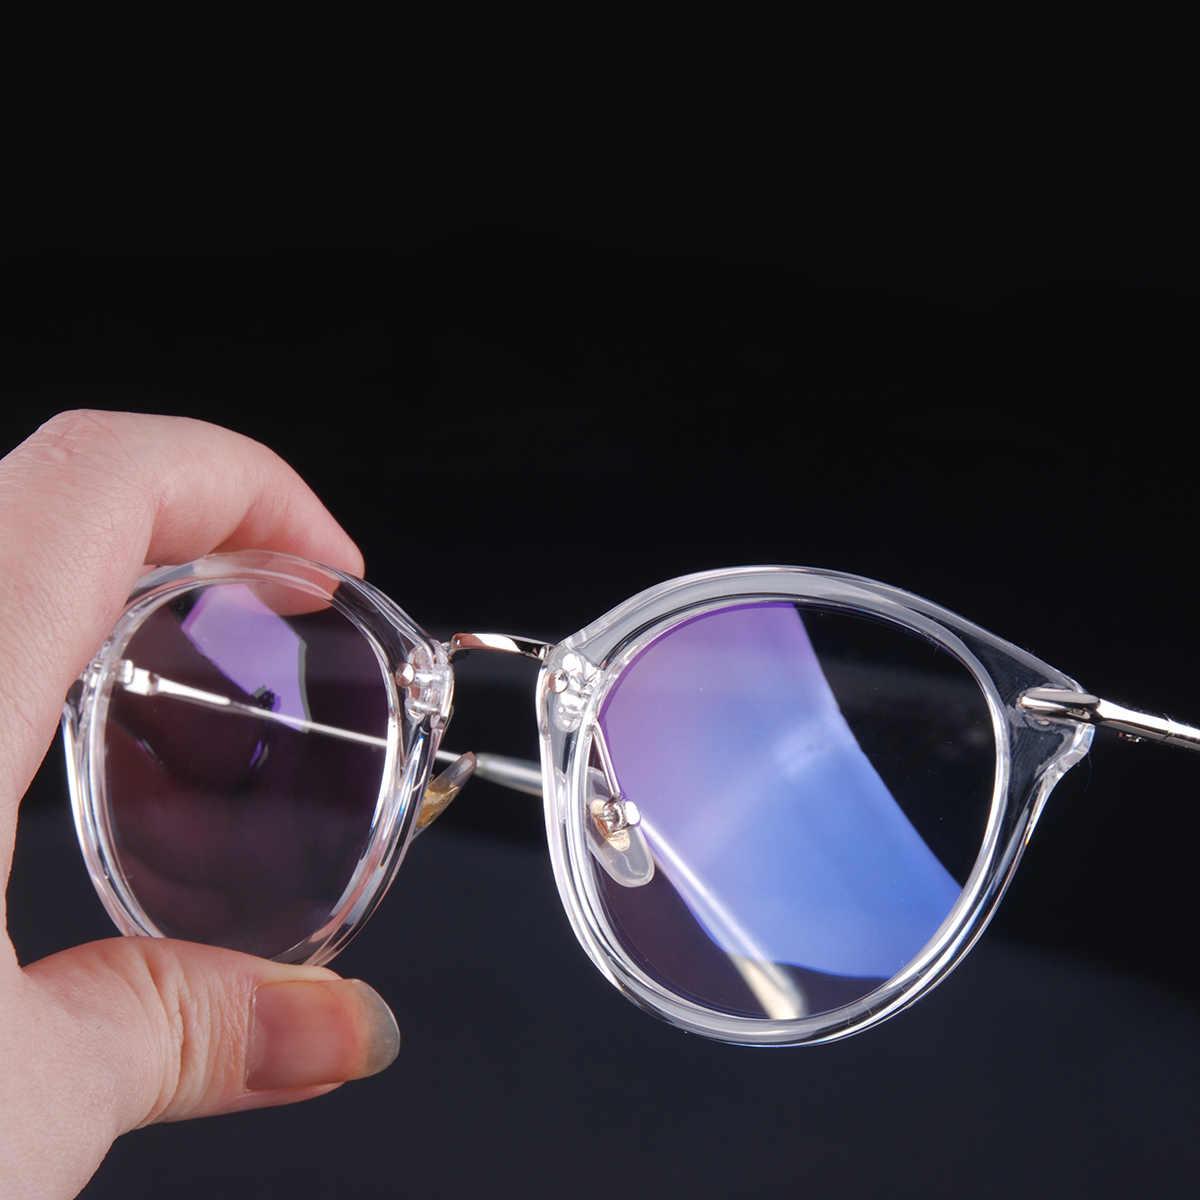 f4d4a35c6e0 Vazrobe Transparent Glasses Women Men Small Round Nerd Points Eyeglasses  Frames for Woman Male Prescription Vintage